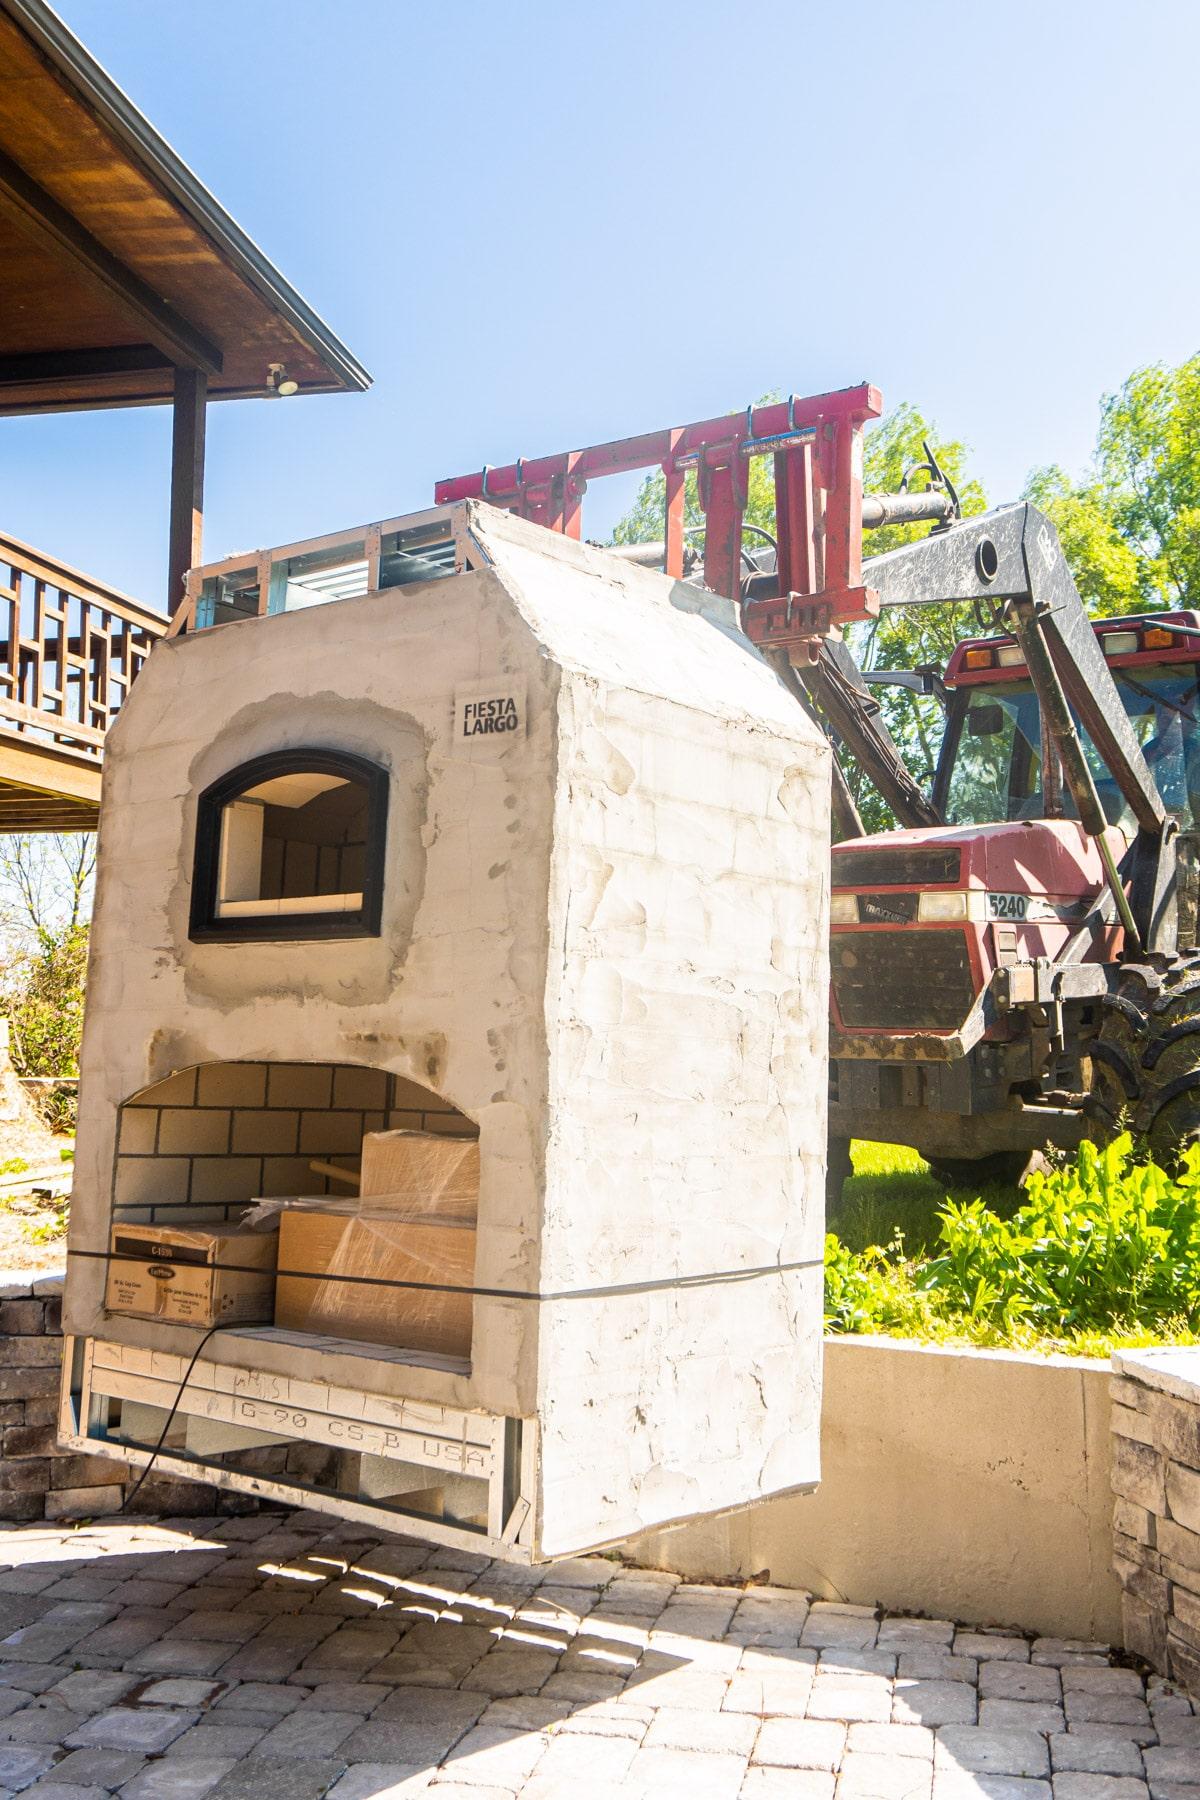 Forklift installing outdoor brick oven on backyard patio